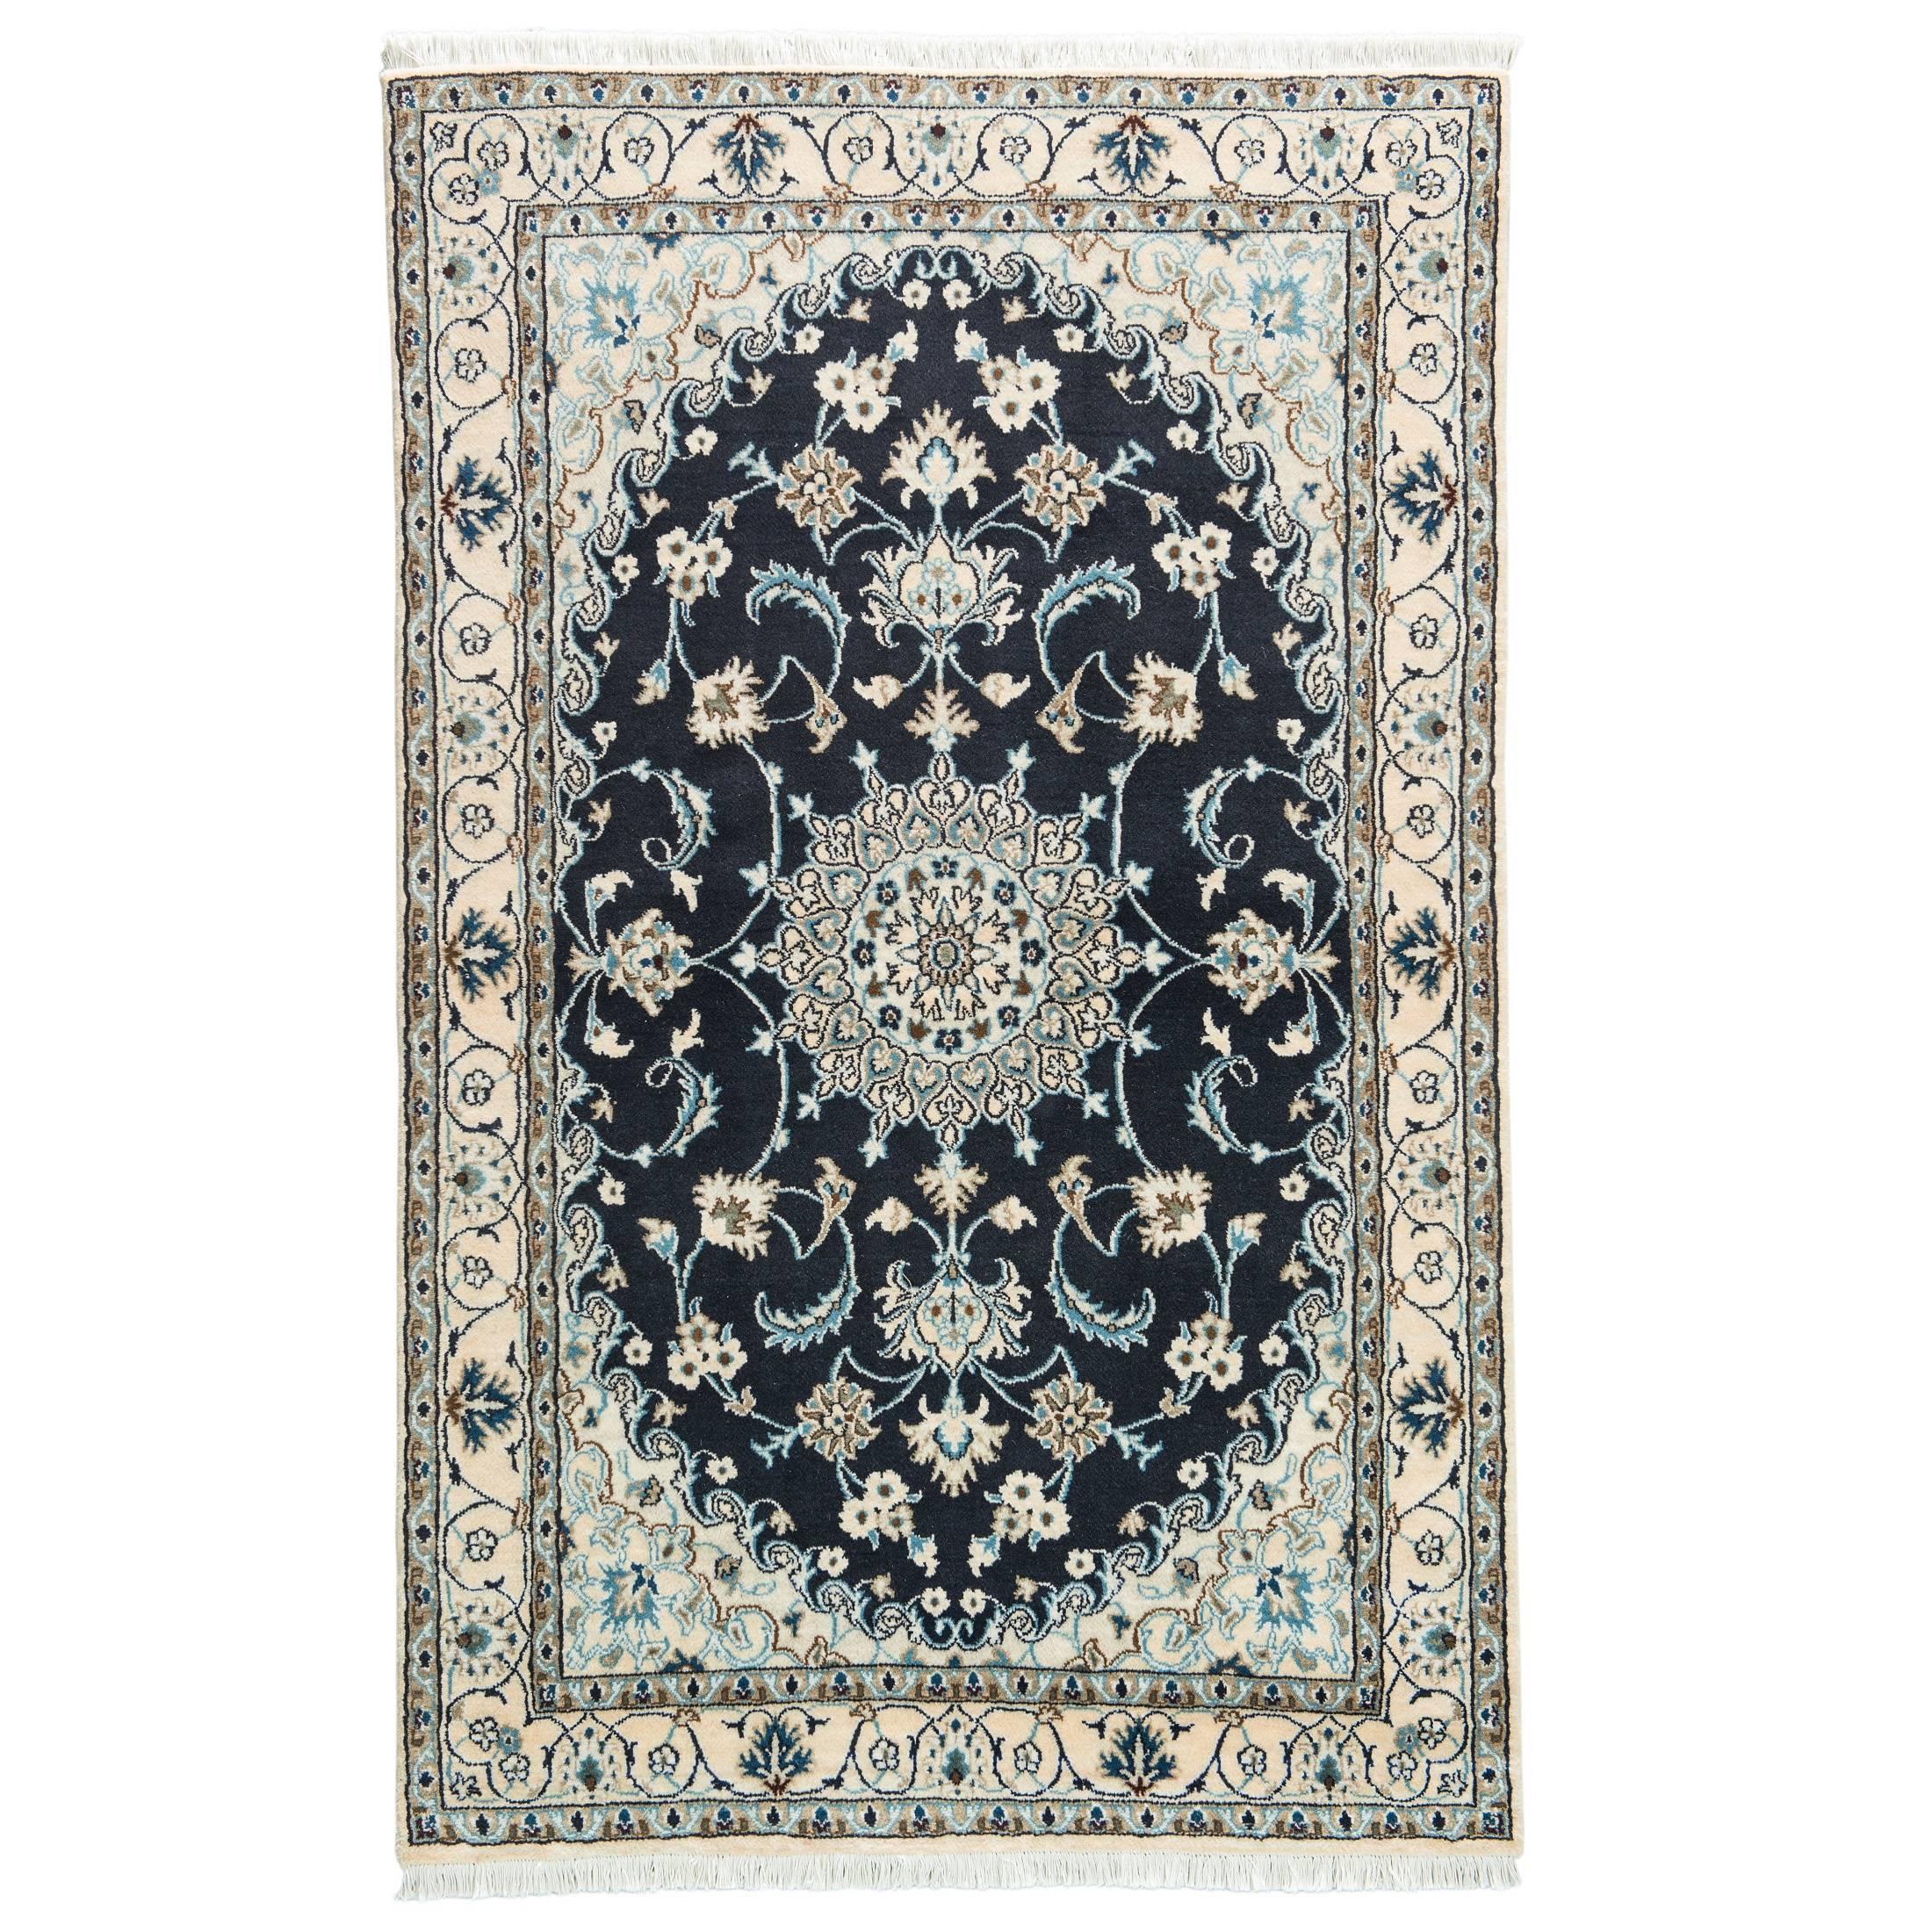 badjestan nain klassische orientteppiche teppiche kibek. Black Bedroom Furniture Sets. Home Design Ideas